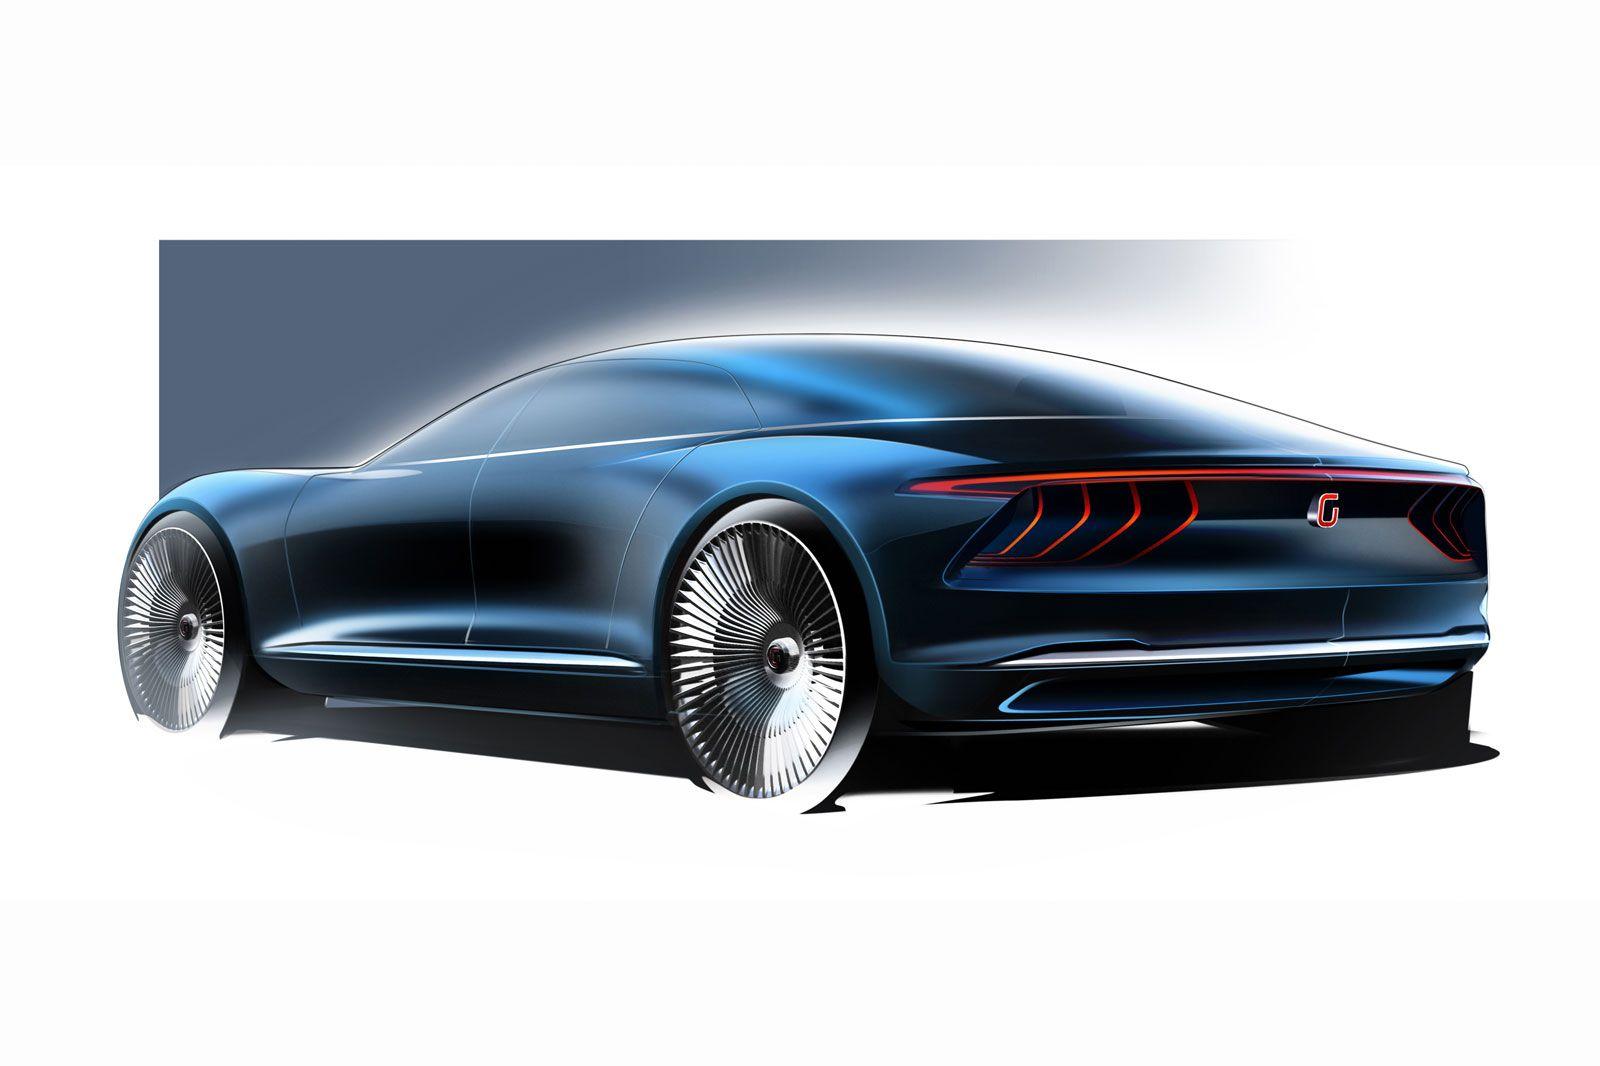 Italdesign Giugiaro GEA Concept - Design Sketch | Sketching | Pinterest